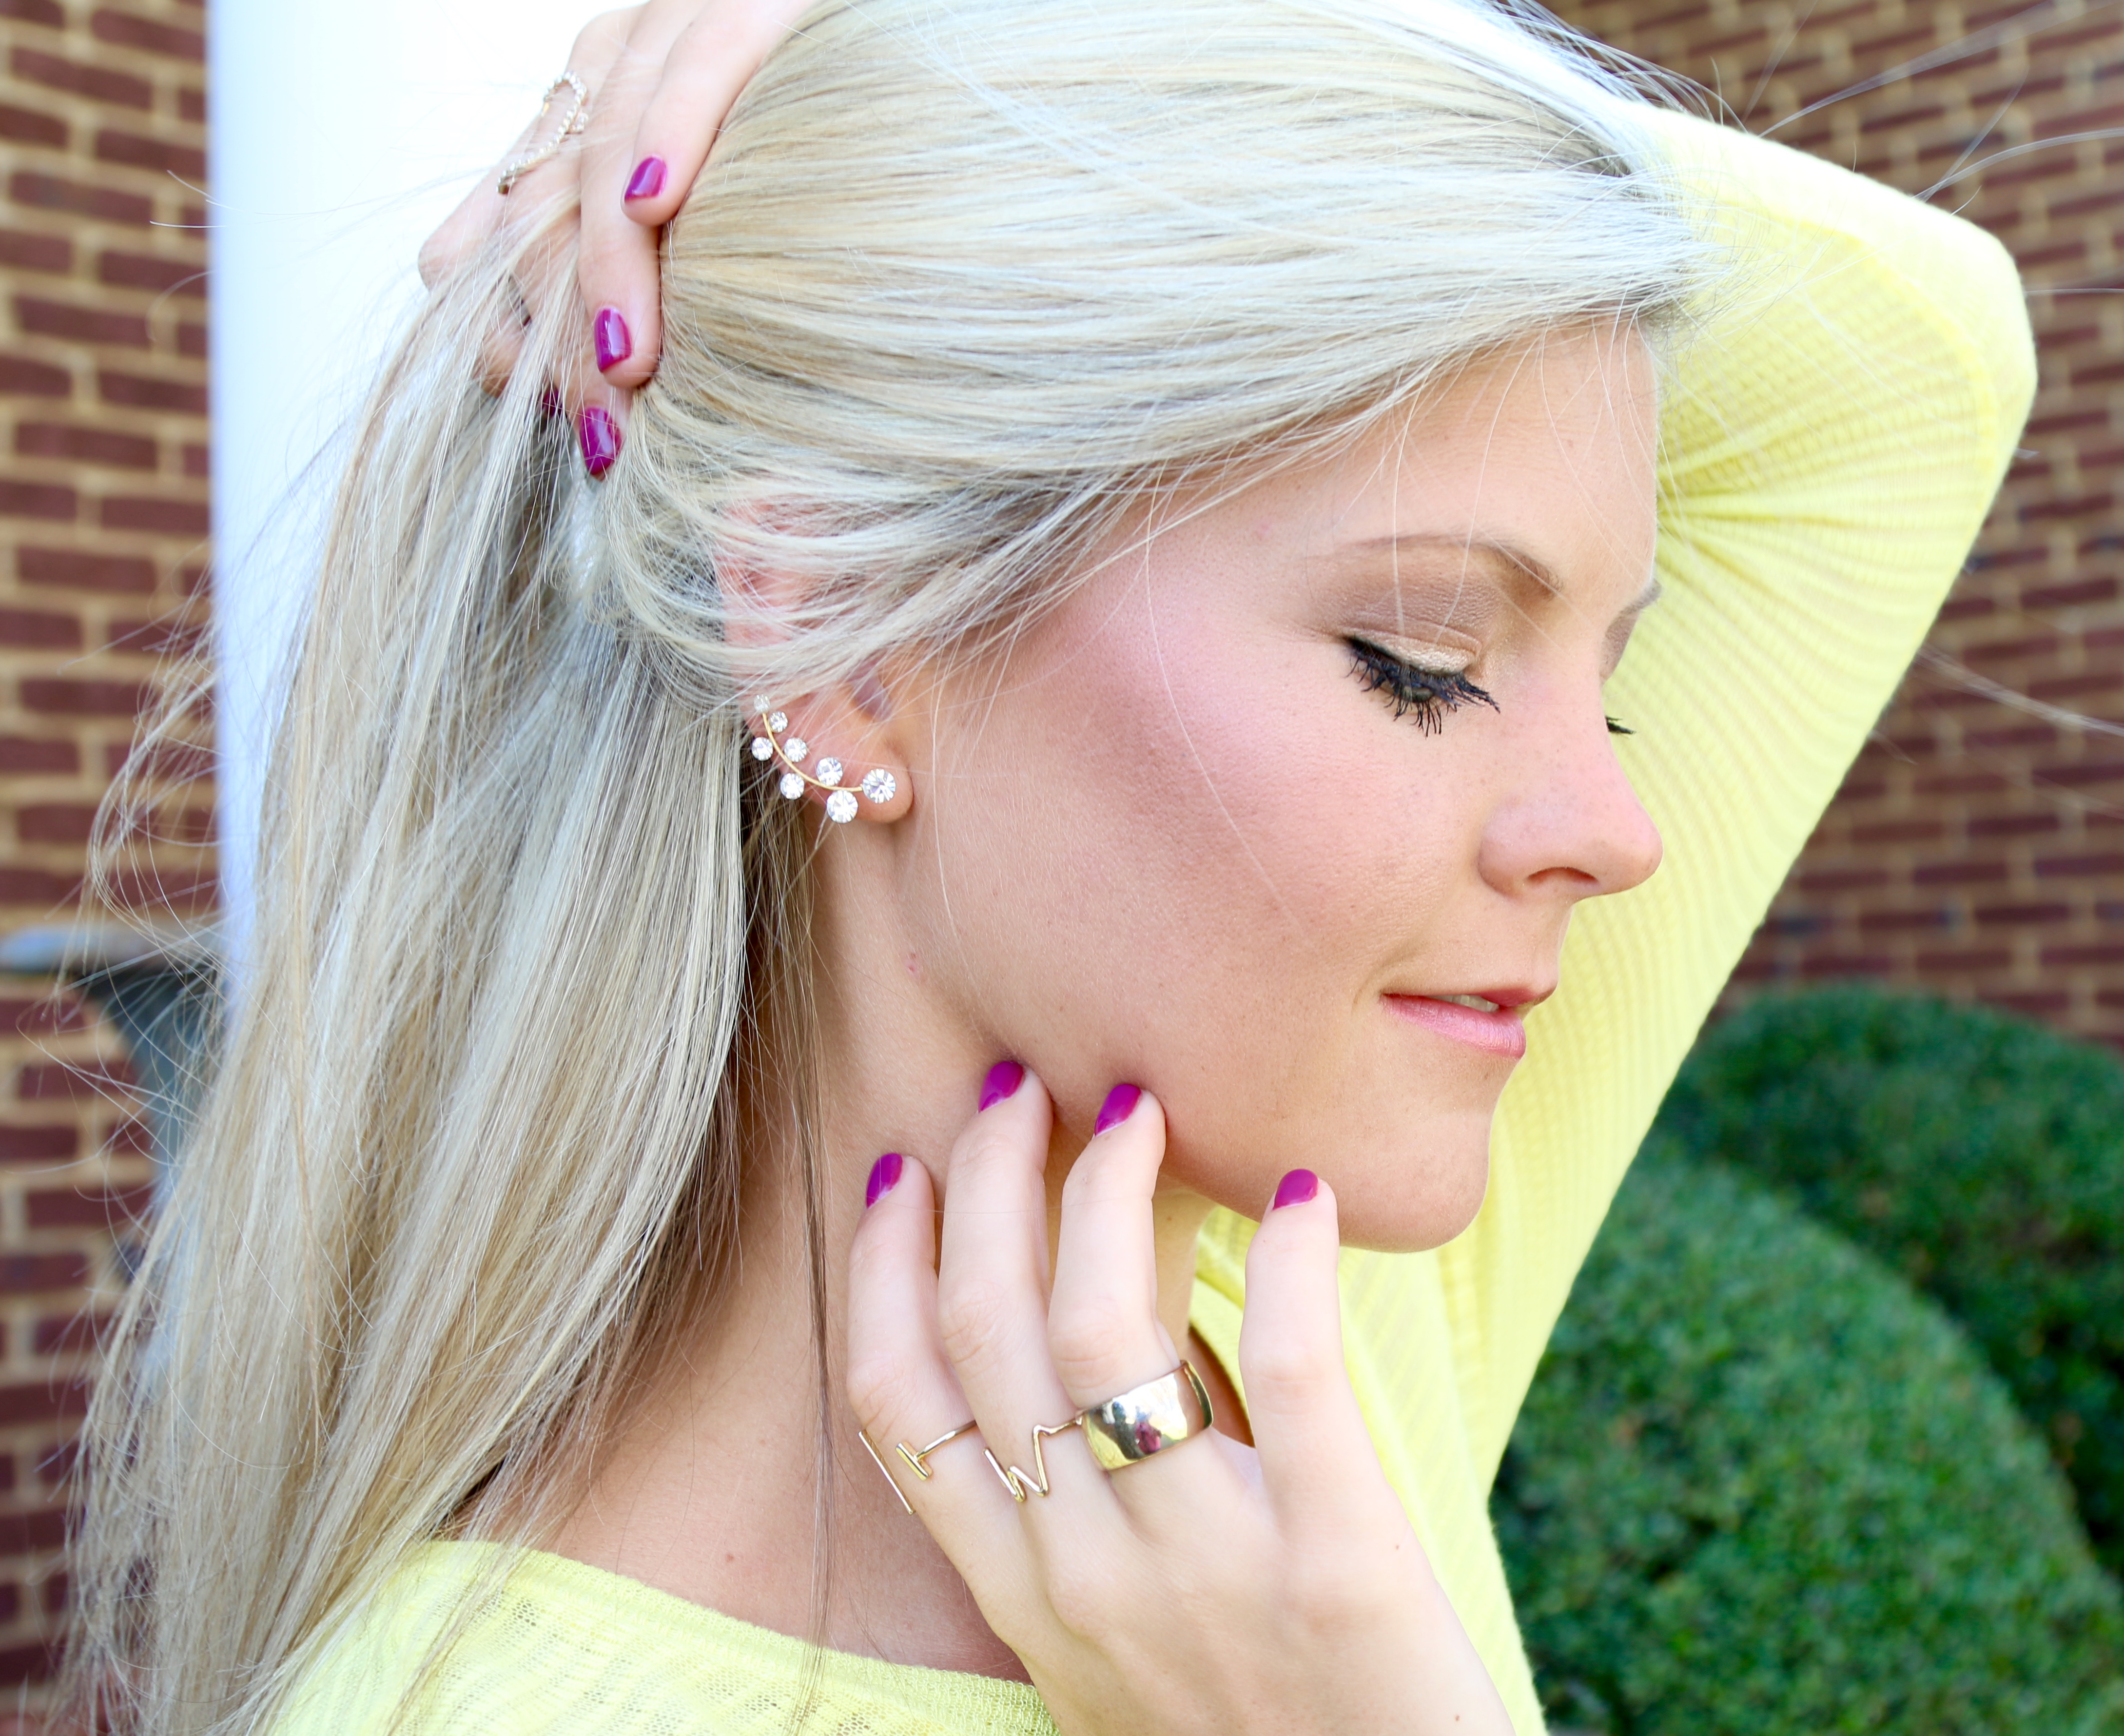 Amorium Jewelry Ear Cuff